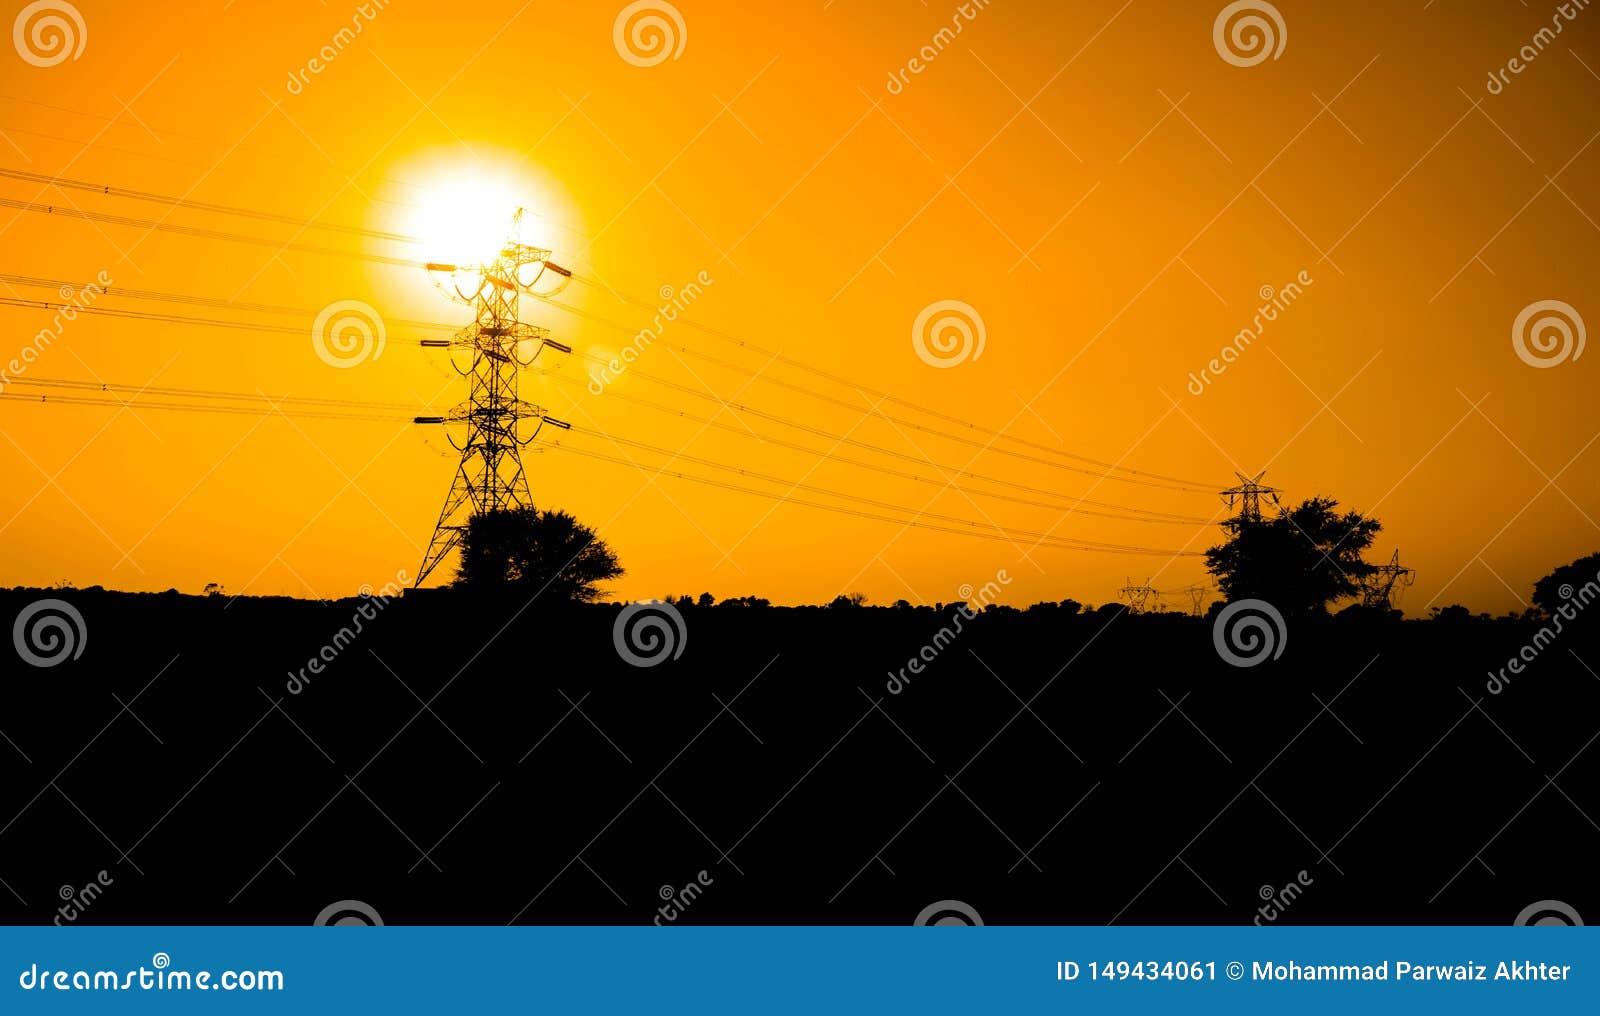 Красивый заход солнца над линией электропередач с зелеными полями